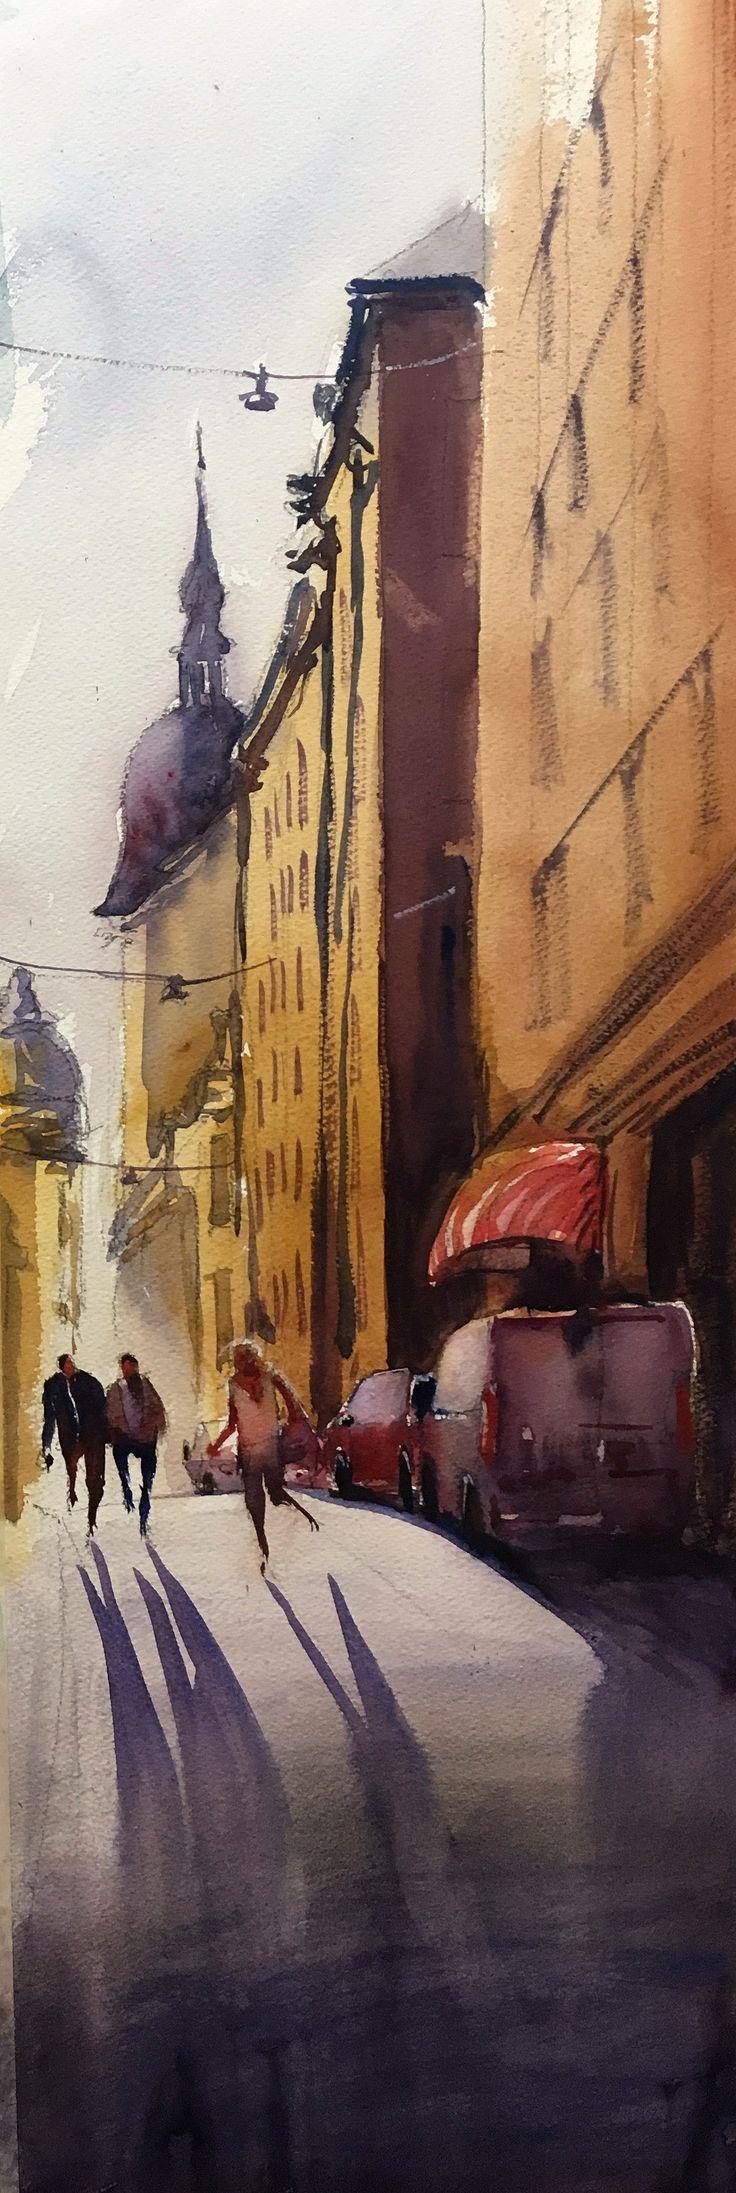 Morgonljus, Stefan Gadnell Akvarell